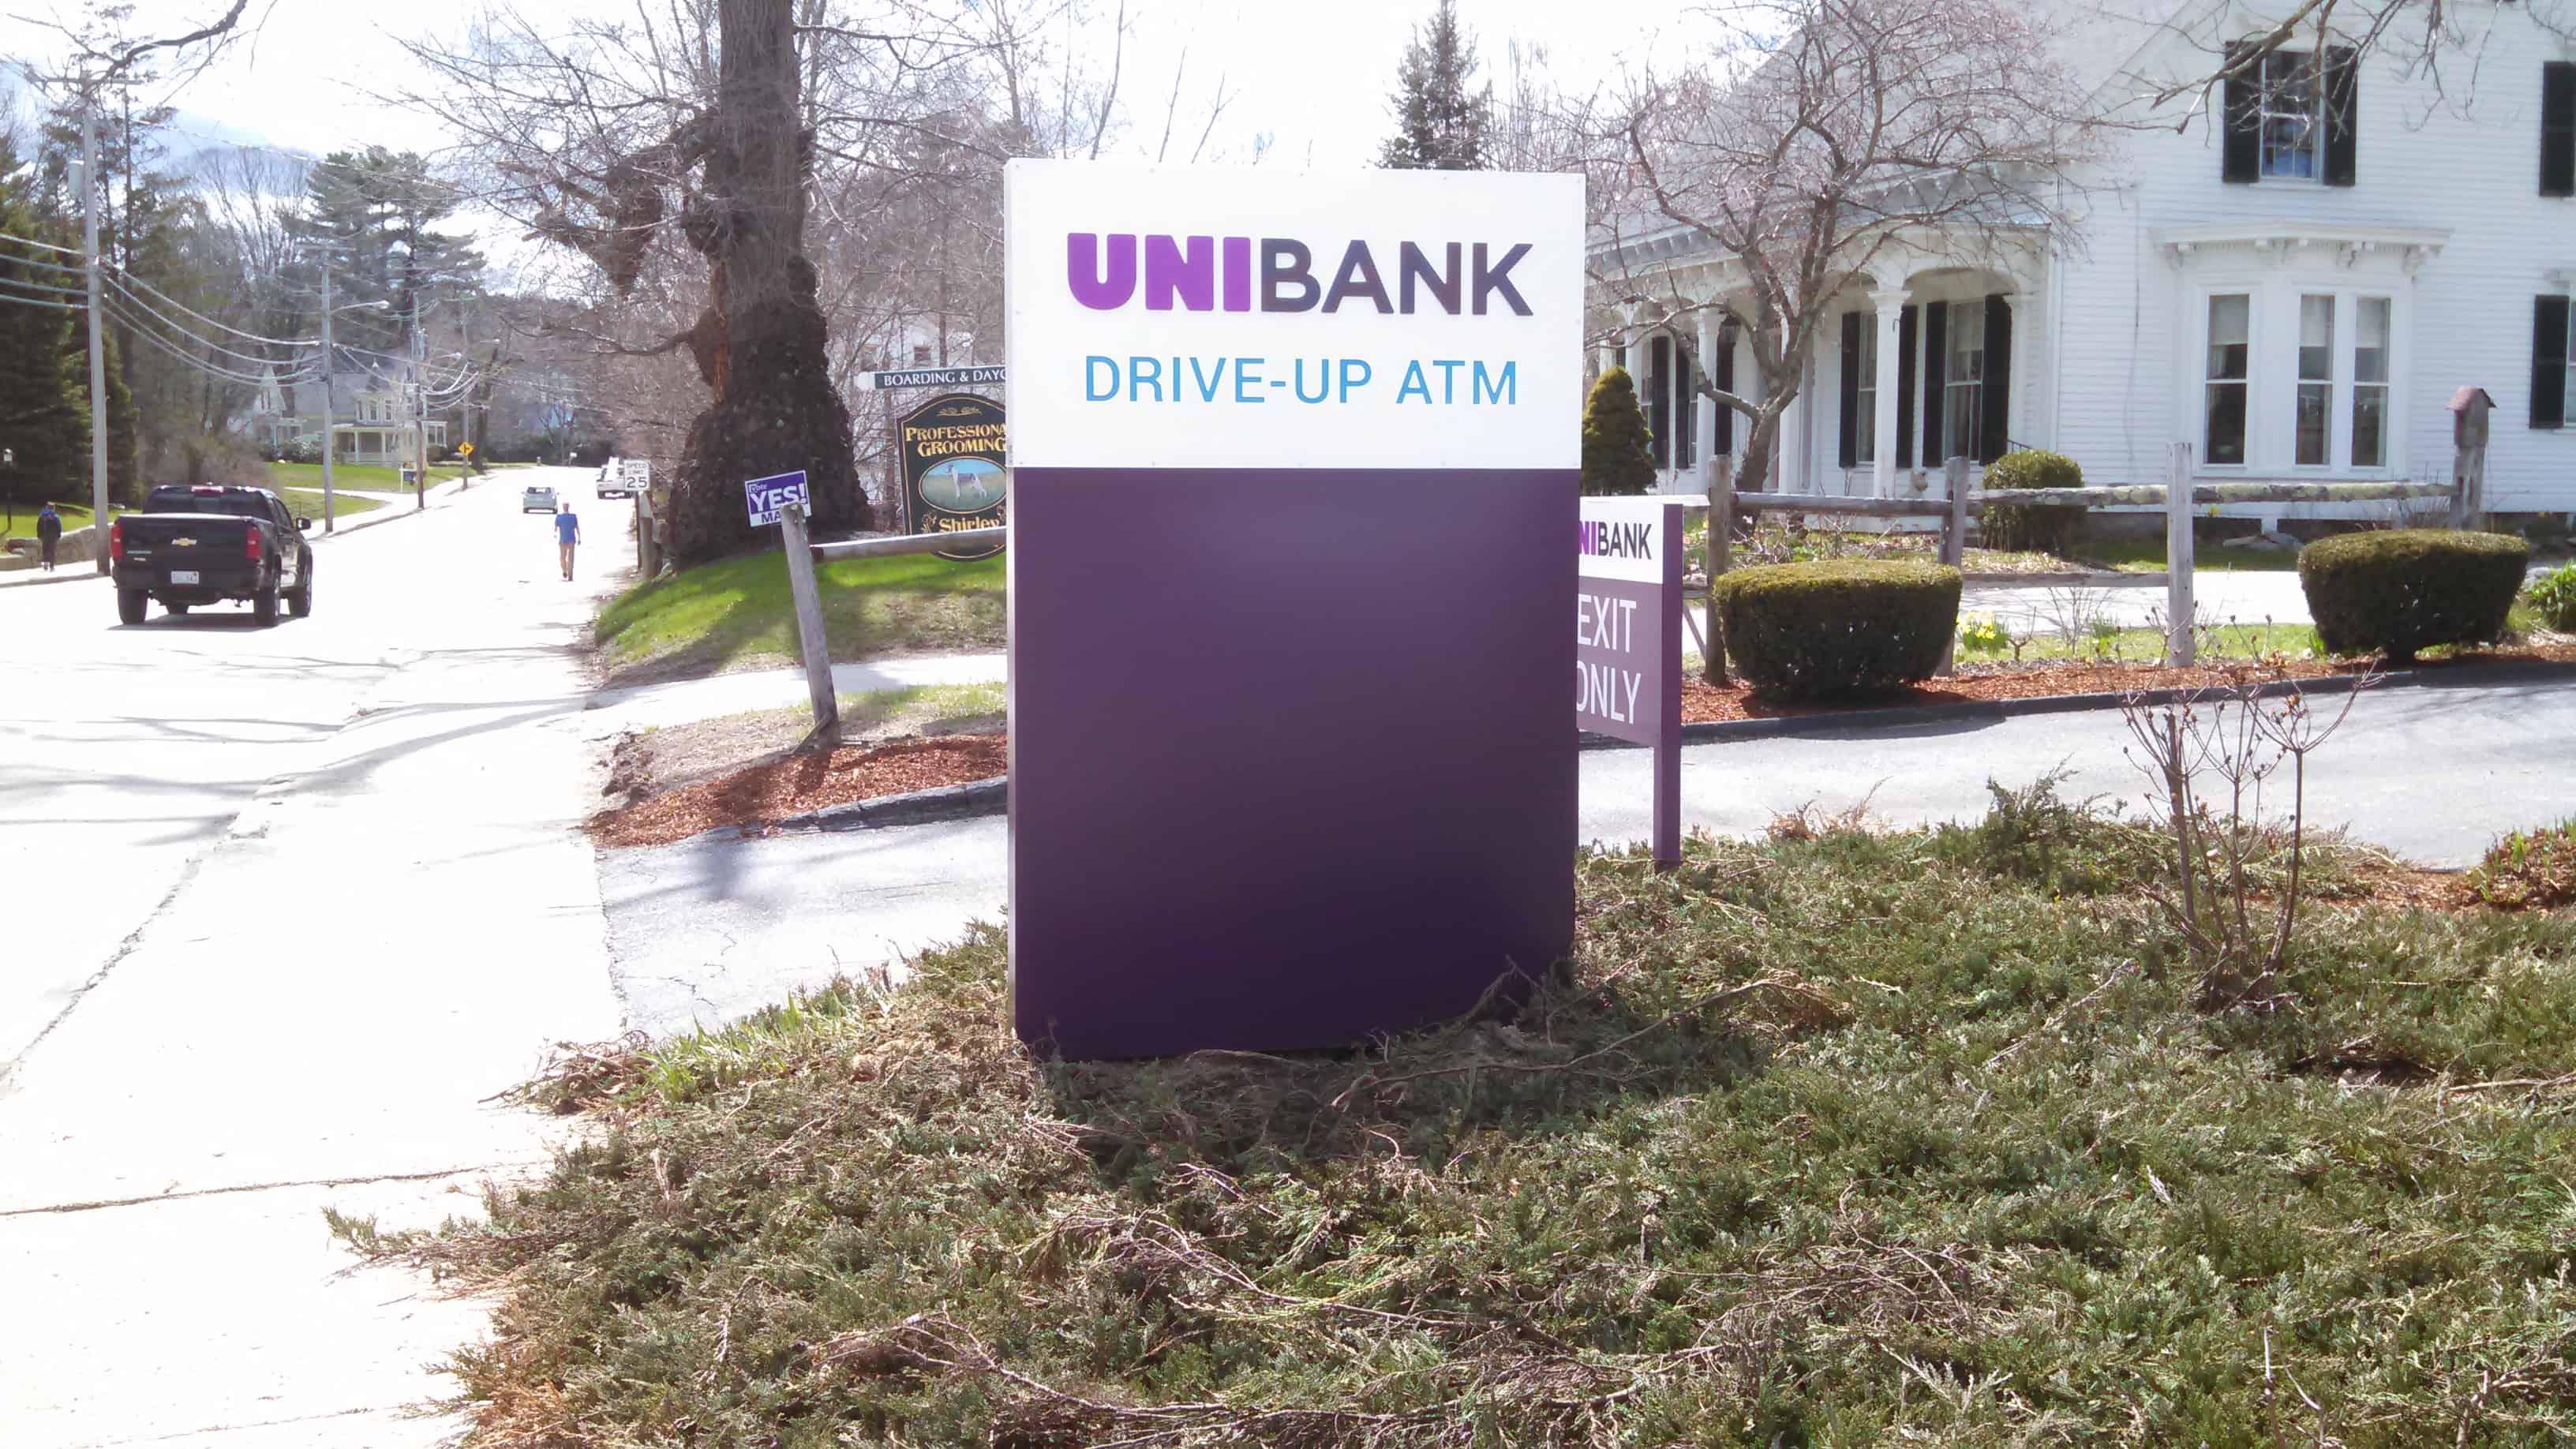 UniBank Worcester